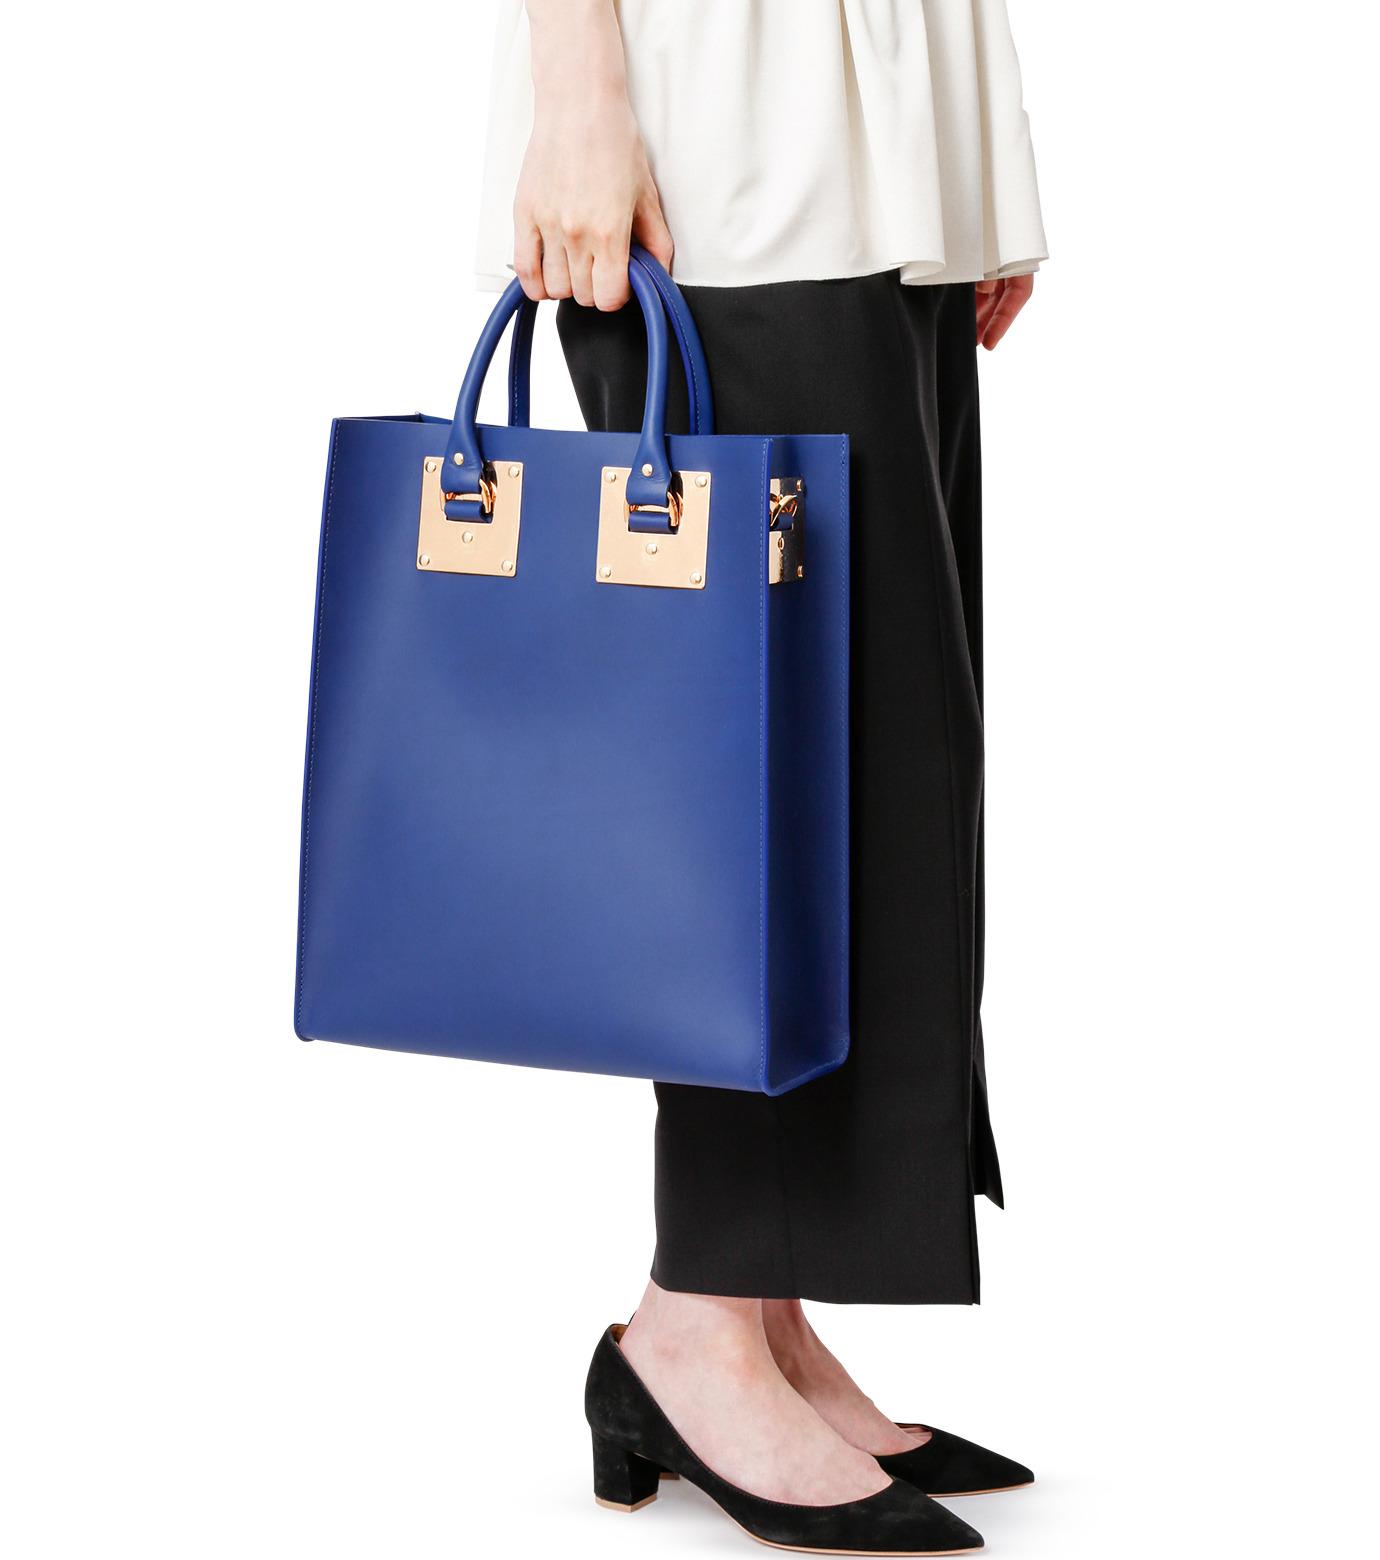 Sophie Hulme(ソフィーヒュルム)のLarge Tote Bag-BLUE(バッグ/bag)-BG047LE-L-92 拡大詳細画像6